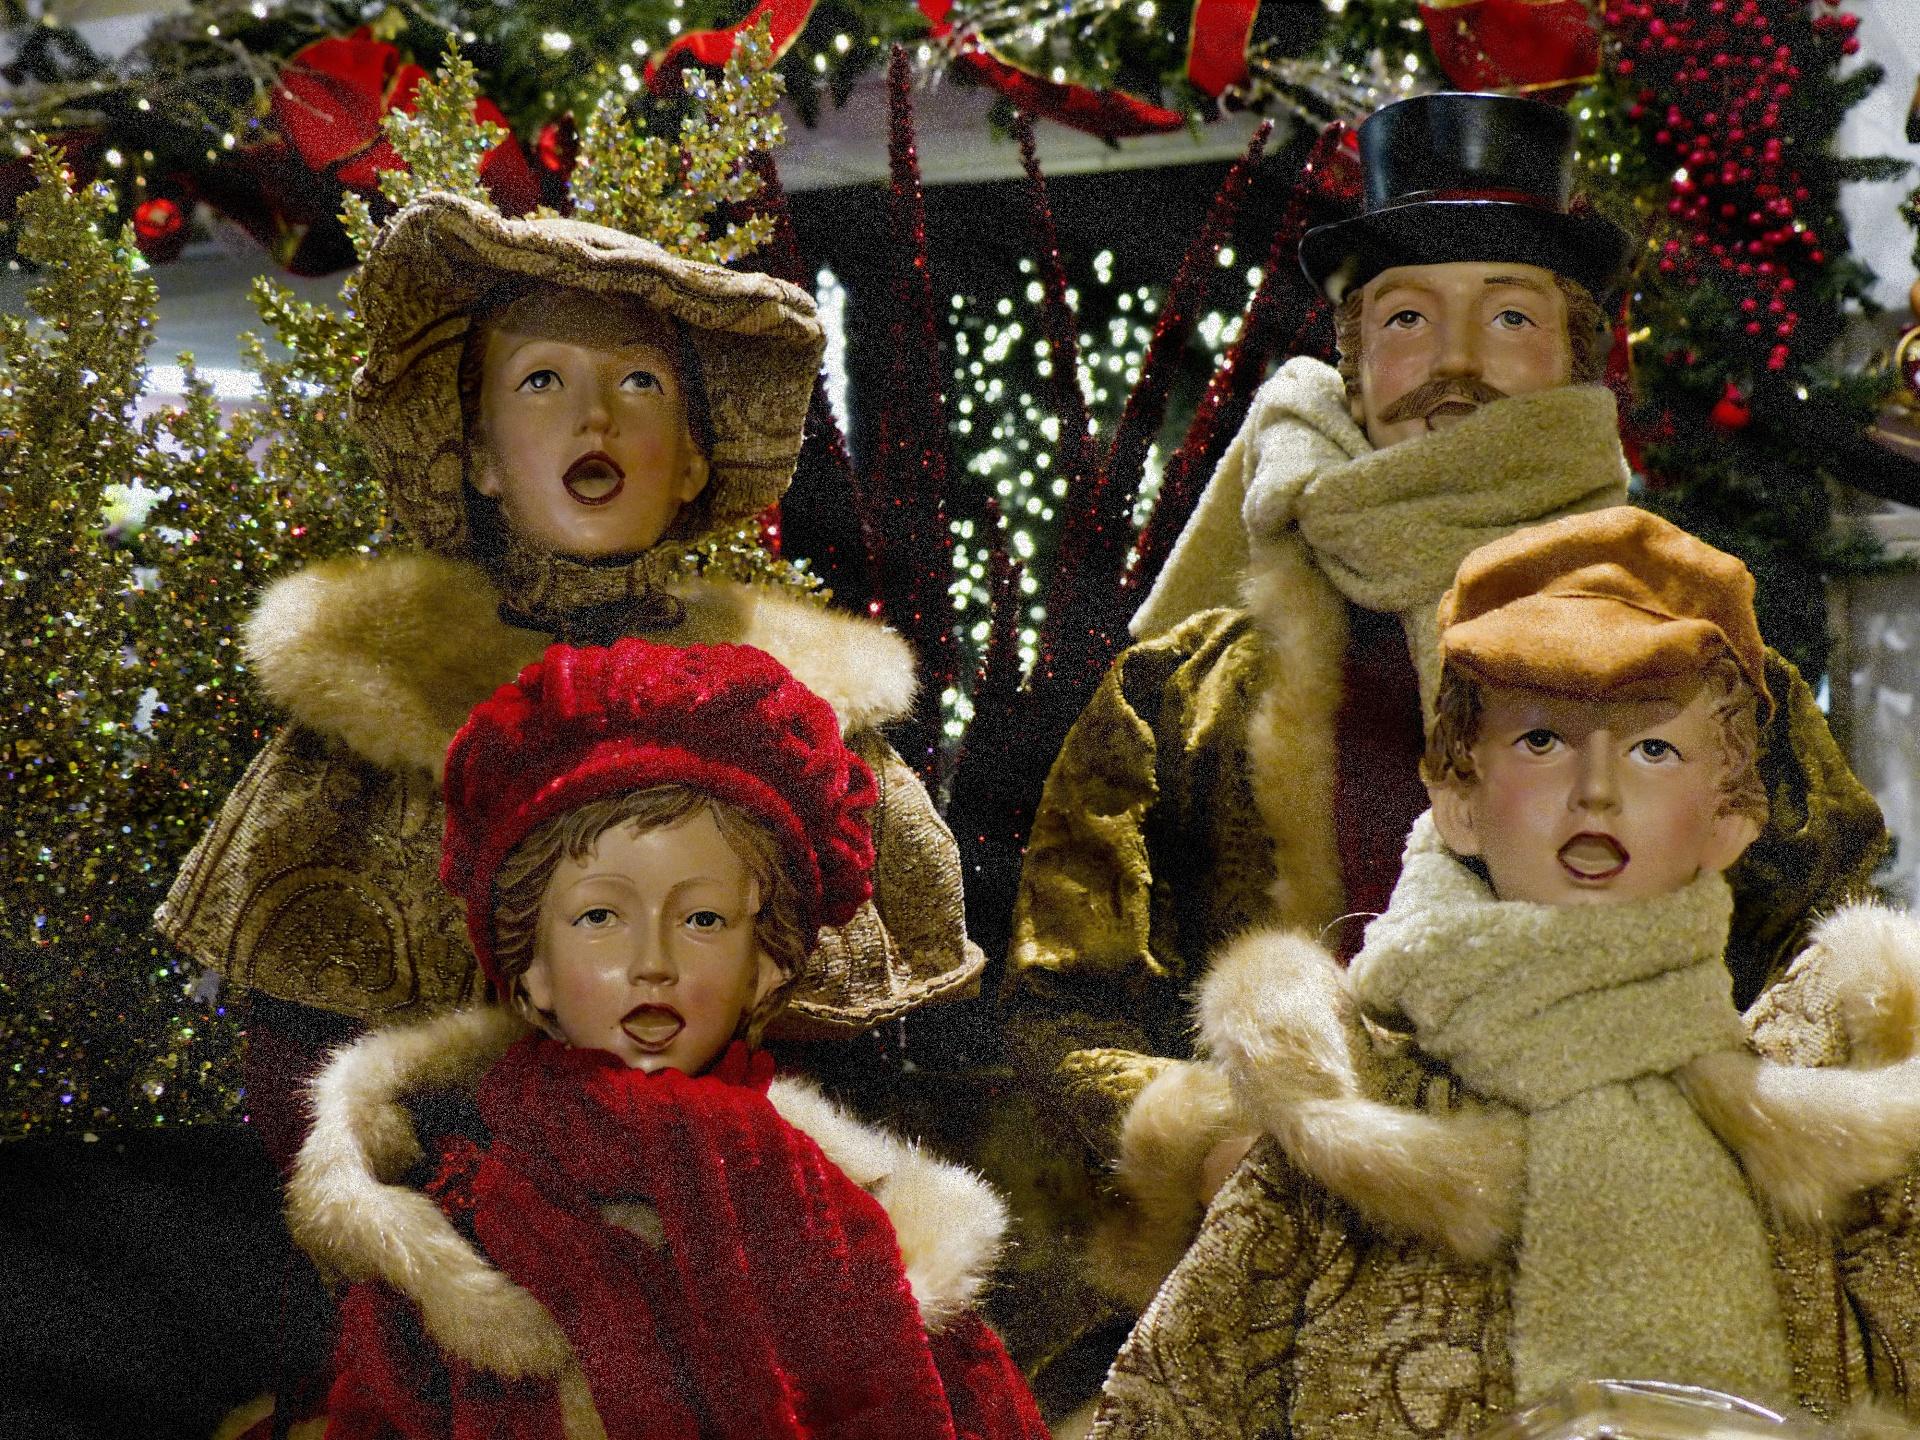 Christmas, Caroling, Singing, Christmas Caroling